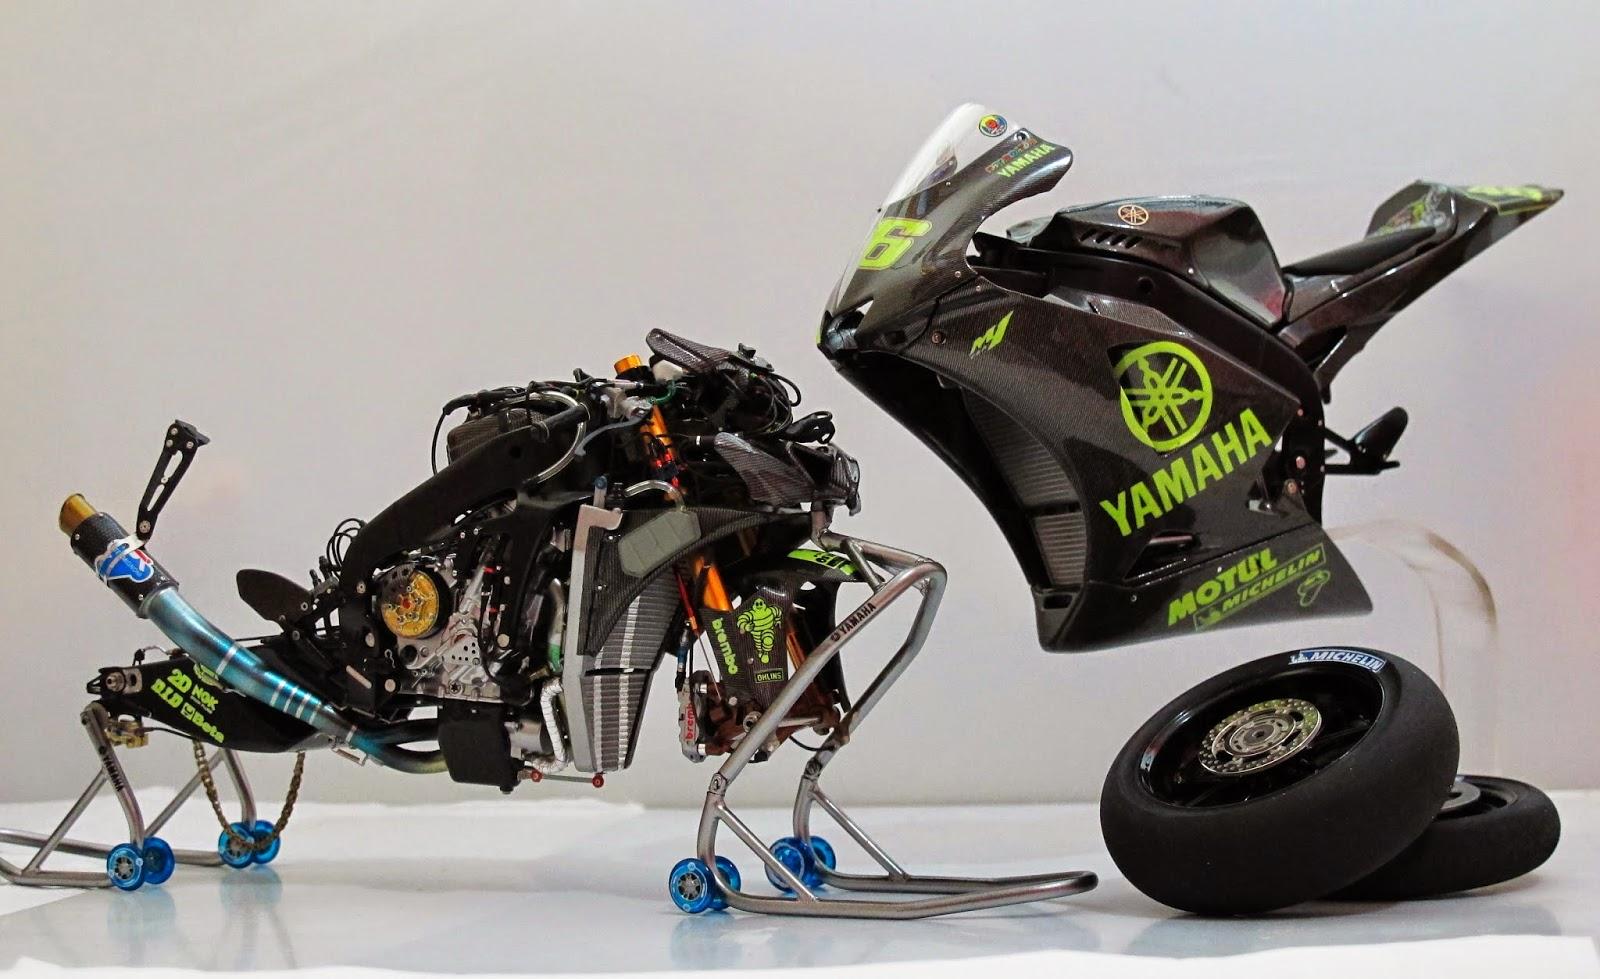 Vr46 Motorbike